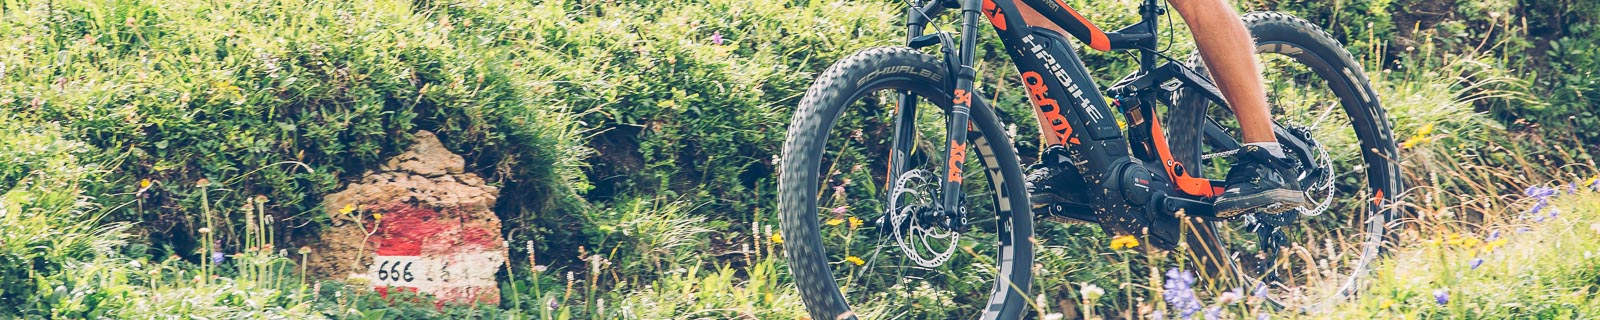 27,5 pollici E-Bike Fully Mountainbikes (E-Mountainbike)